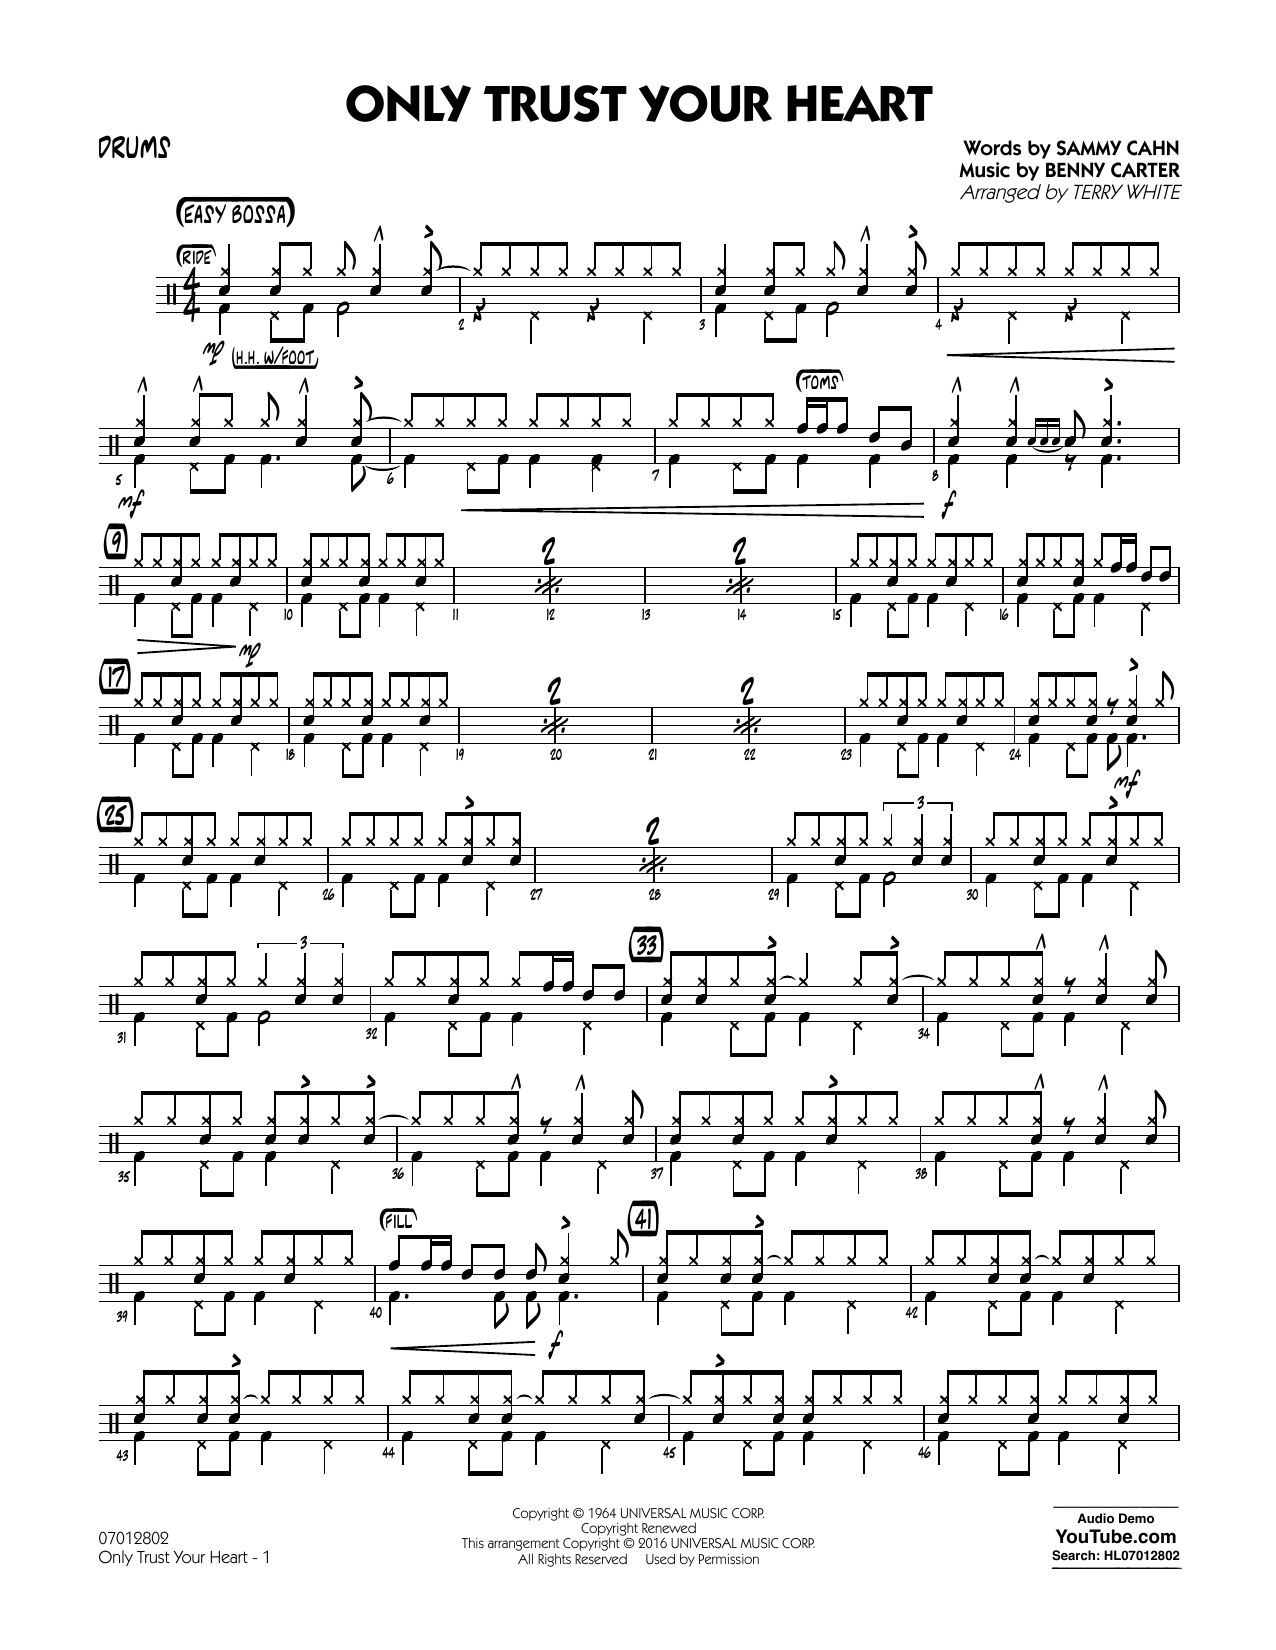 Sammy Cahn - Only Trust Your Heart - Drums